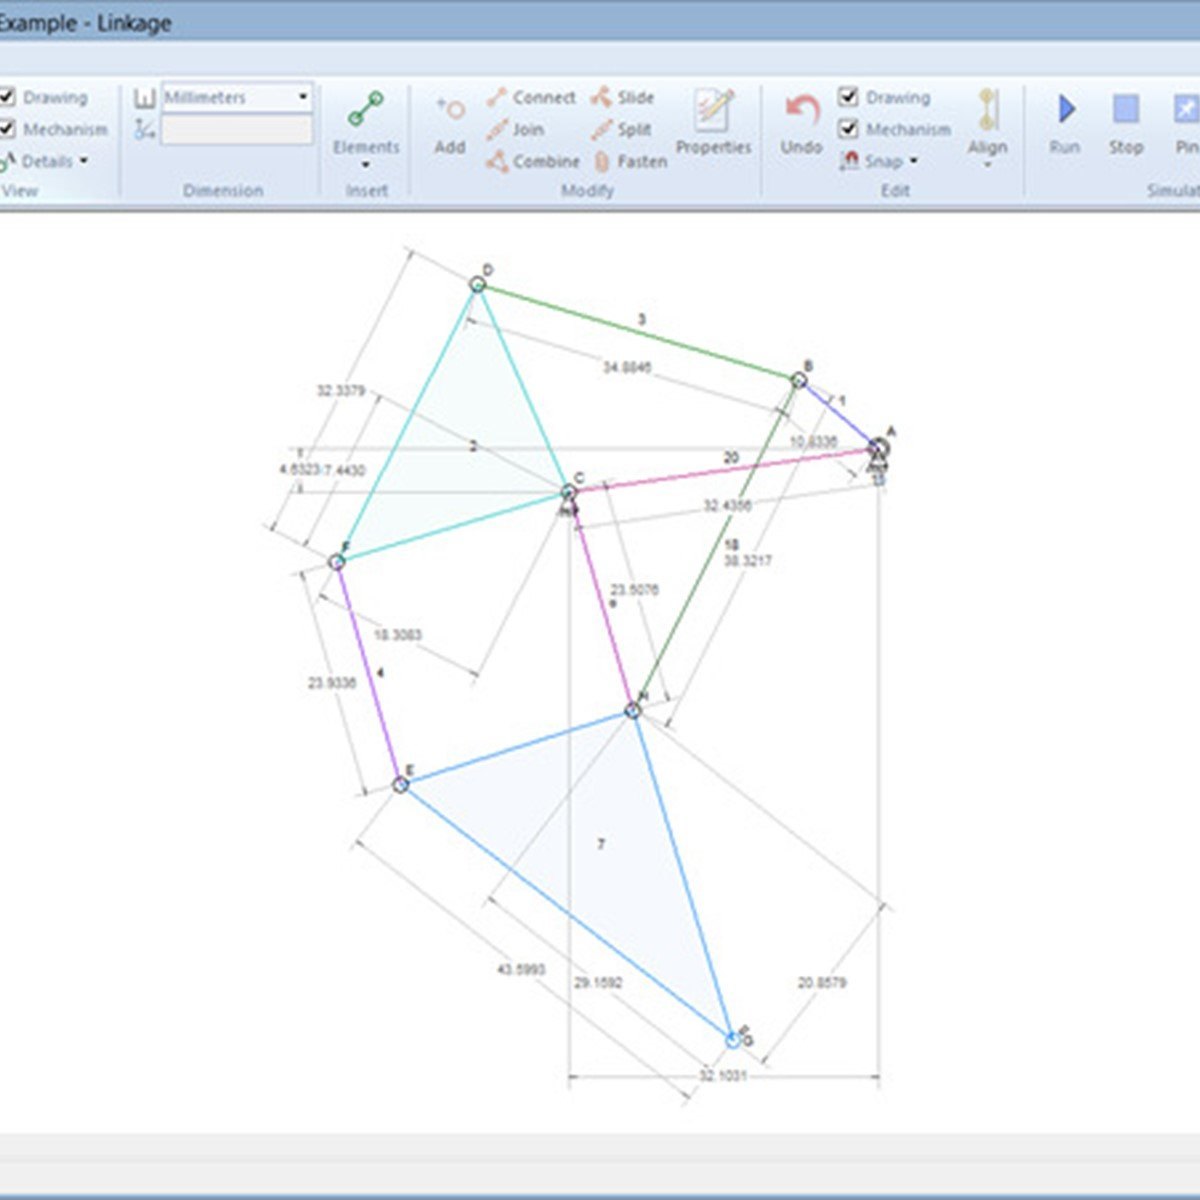 Linkage Mechanism Designer and Simulator Alternatives and